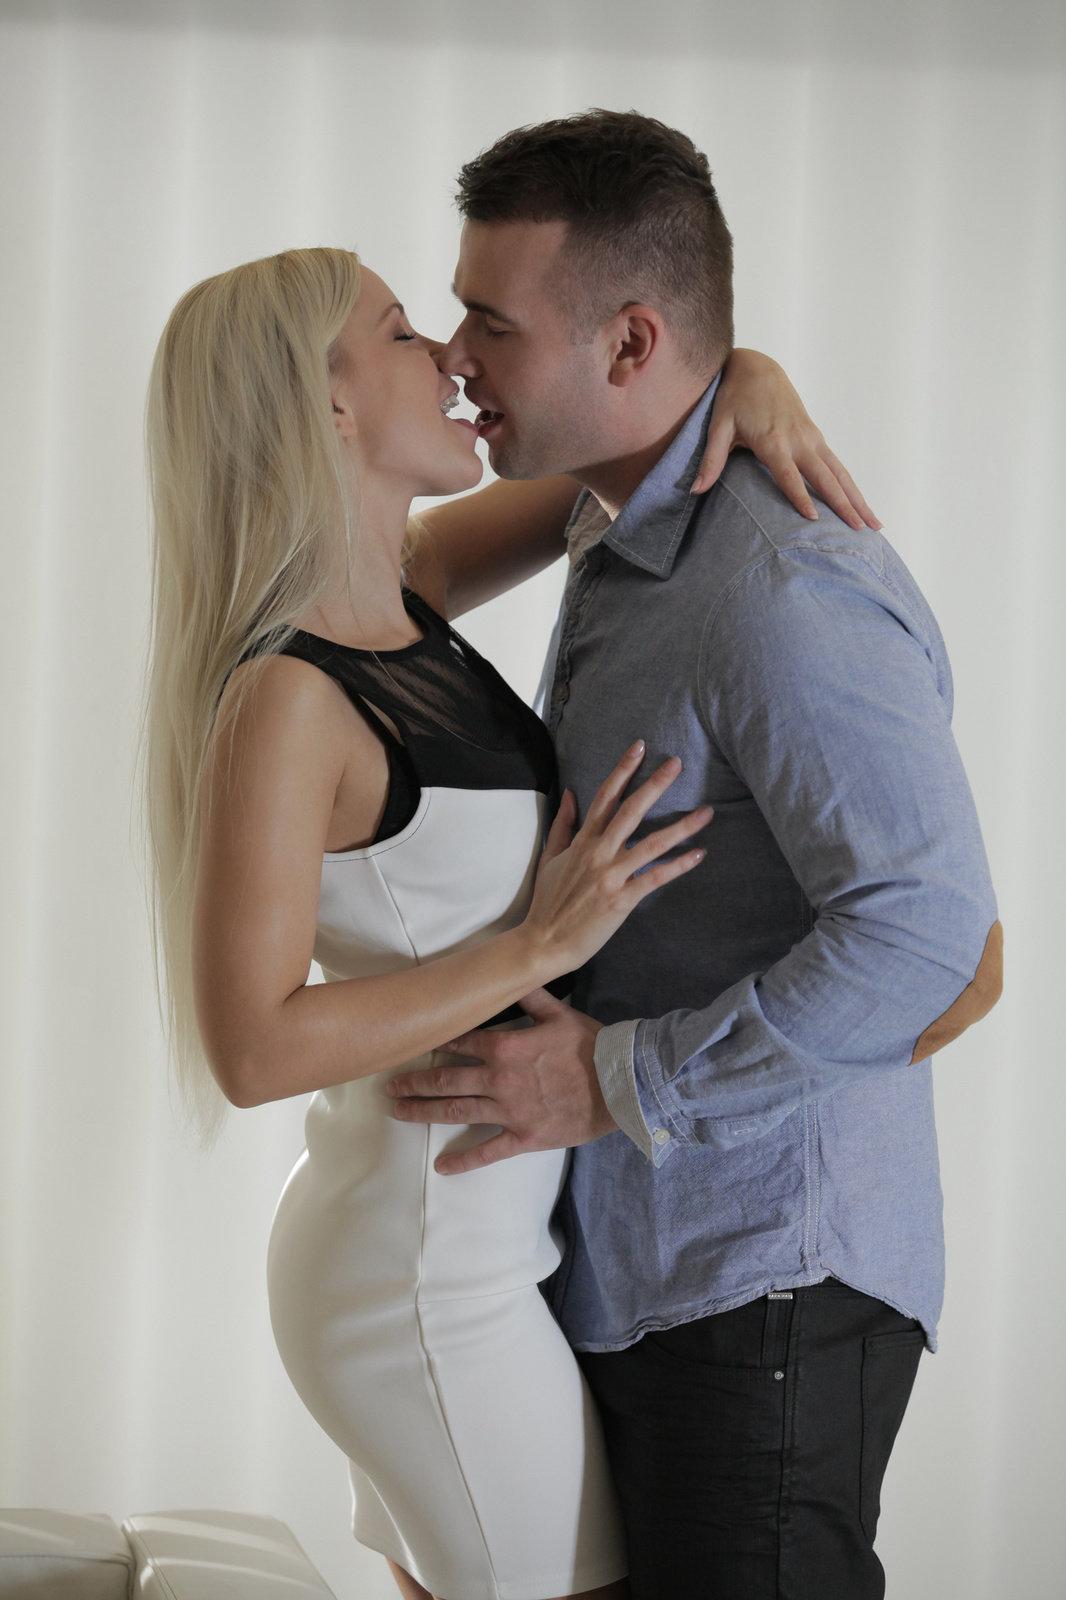 Art making X porn erotic love